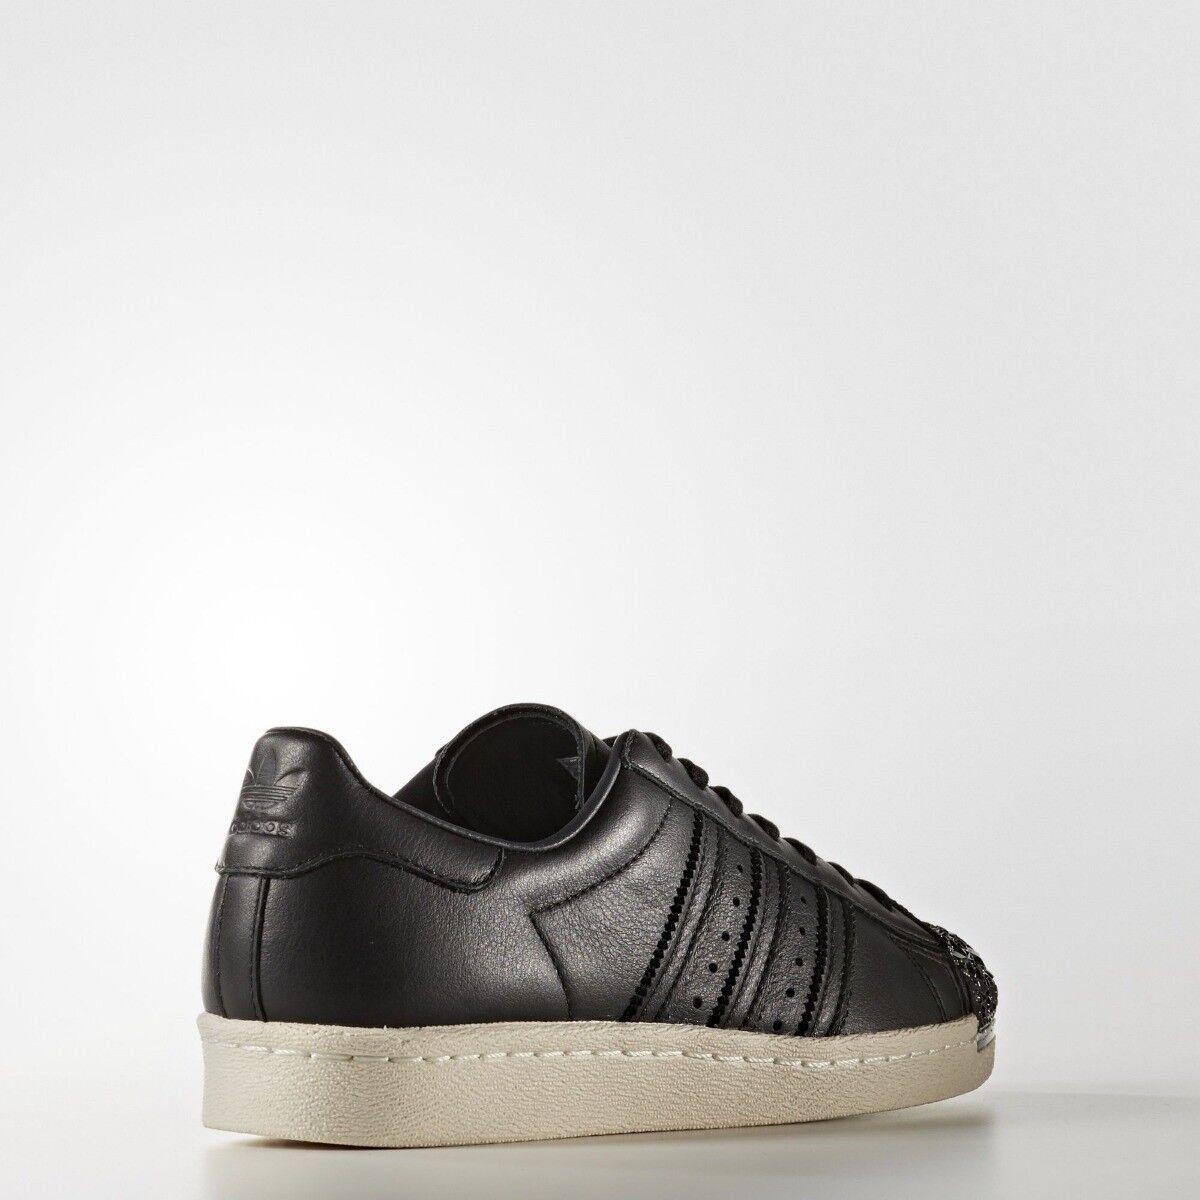 ADIDAS Superstar Superstar Superstar 80s 3D METAL TOE scarpa scarpe da ginnastica da donna Taglia 4 4.5 5.5 RRP /- a1e1fb